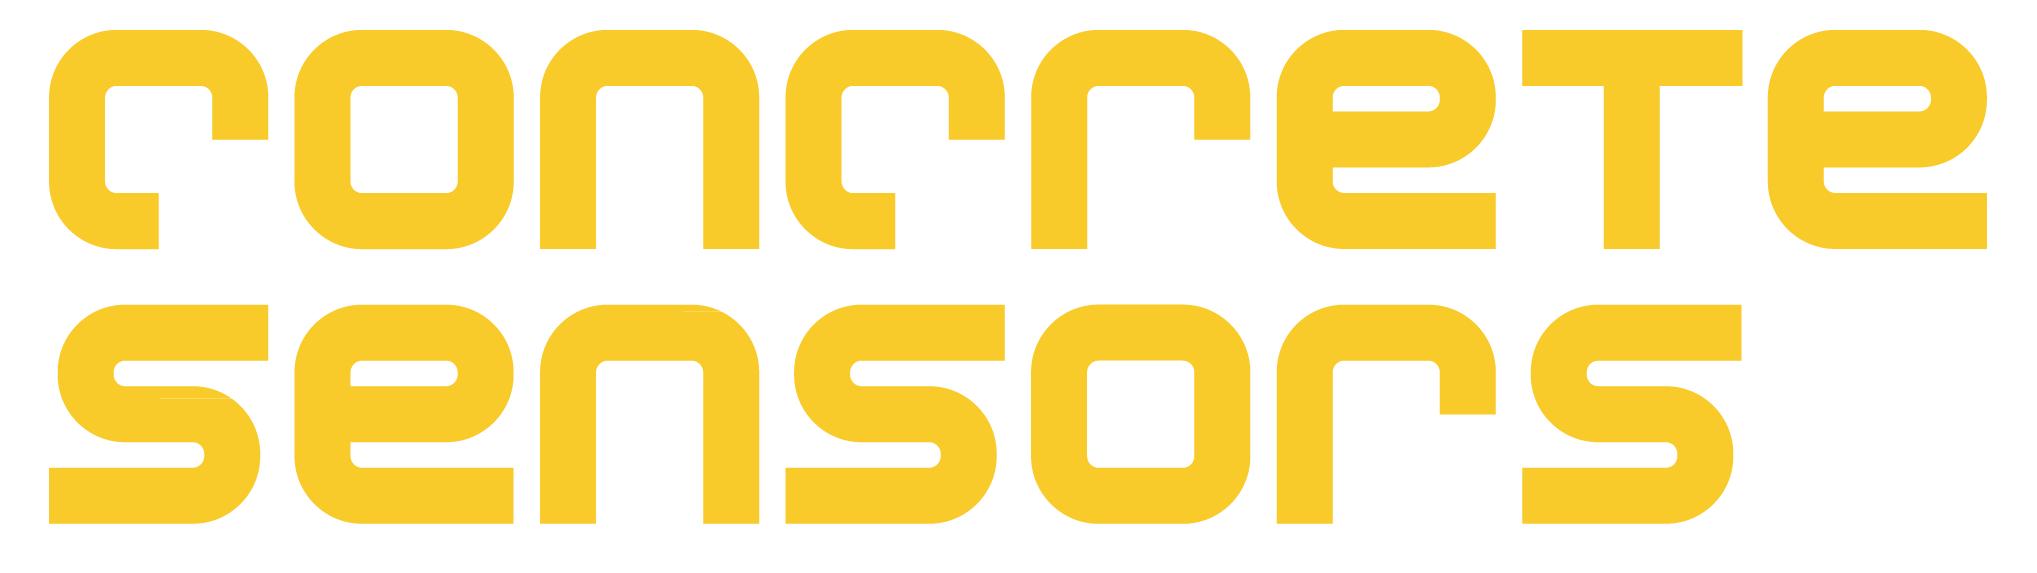 Concrete Sensors Logo - HiRes.png